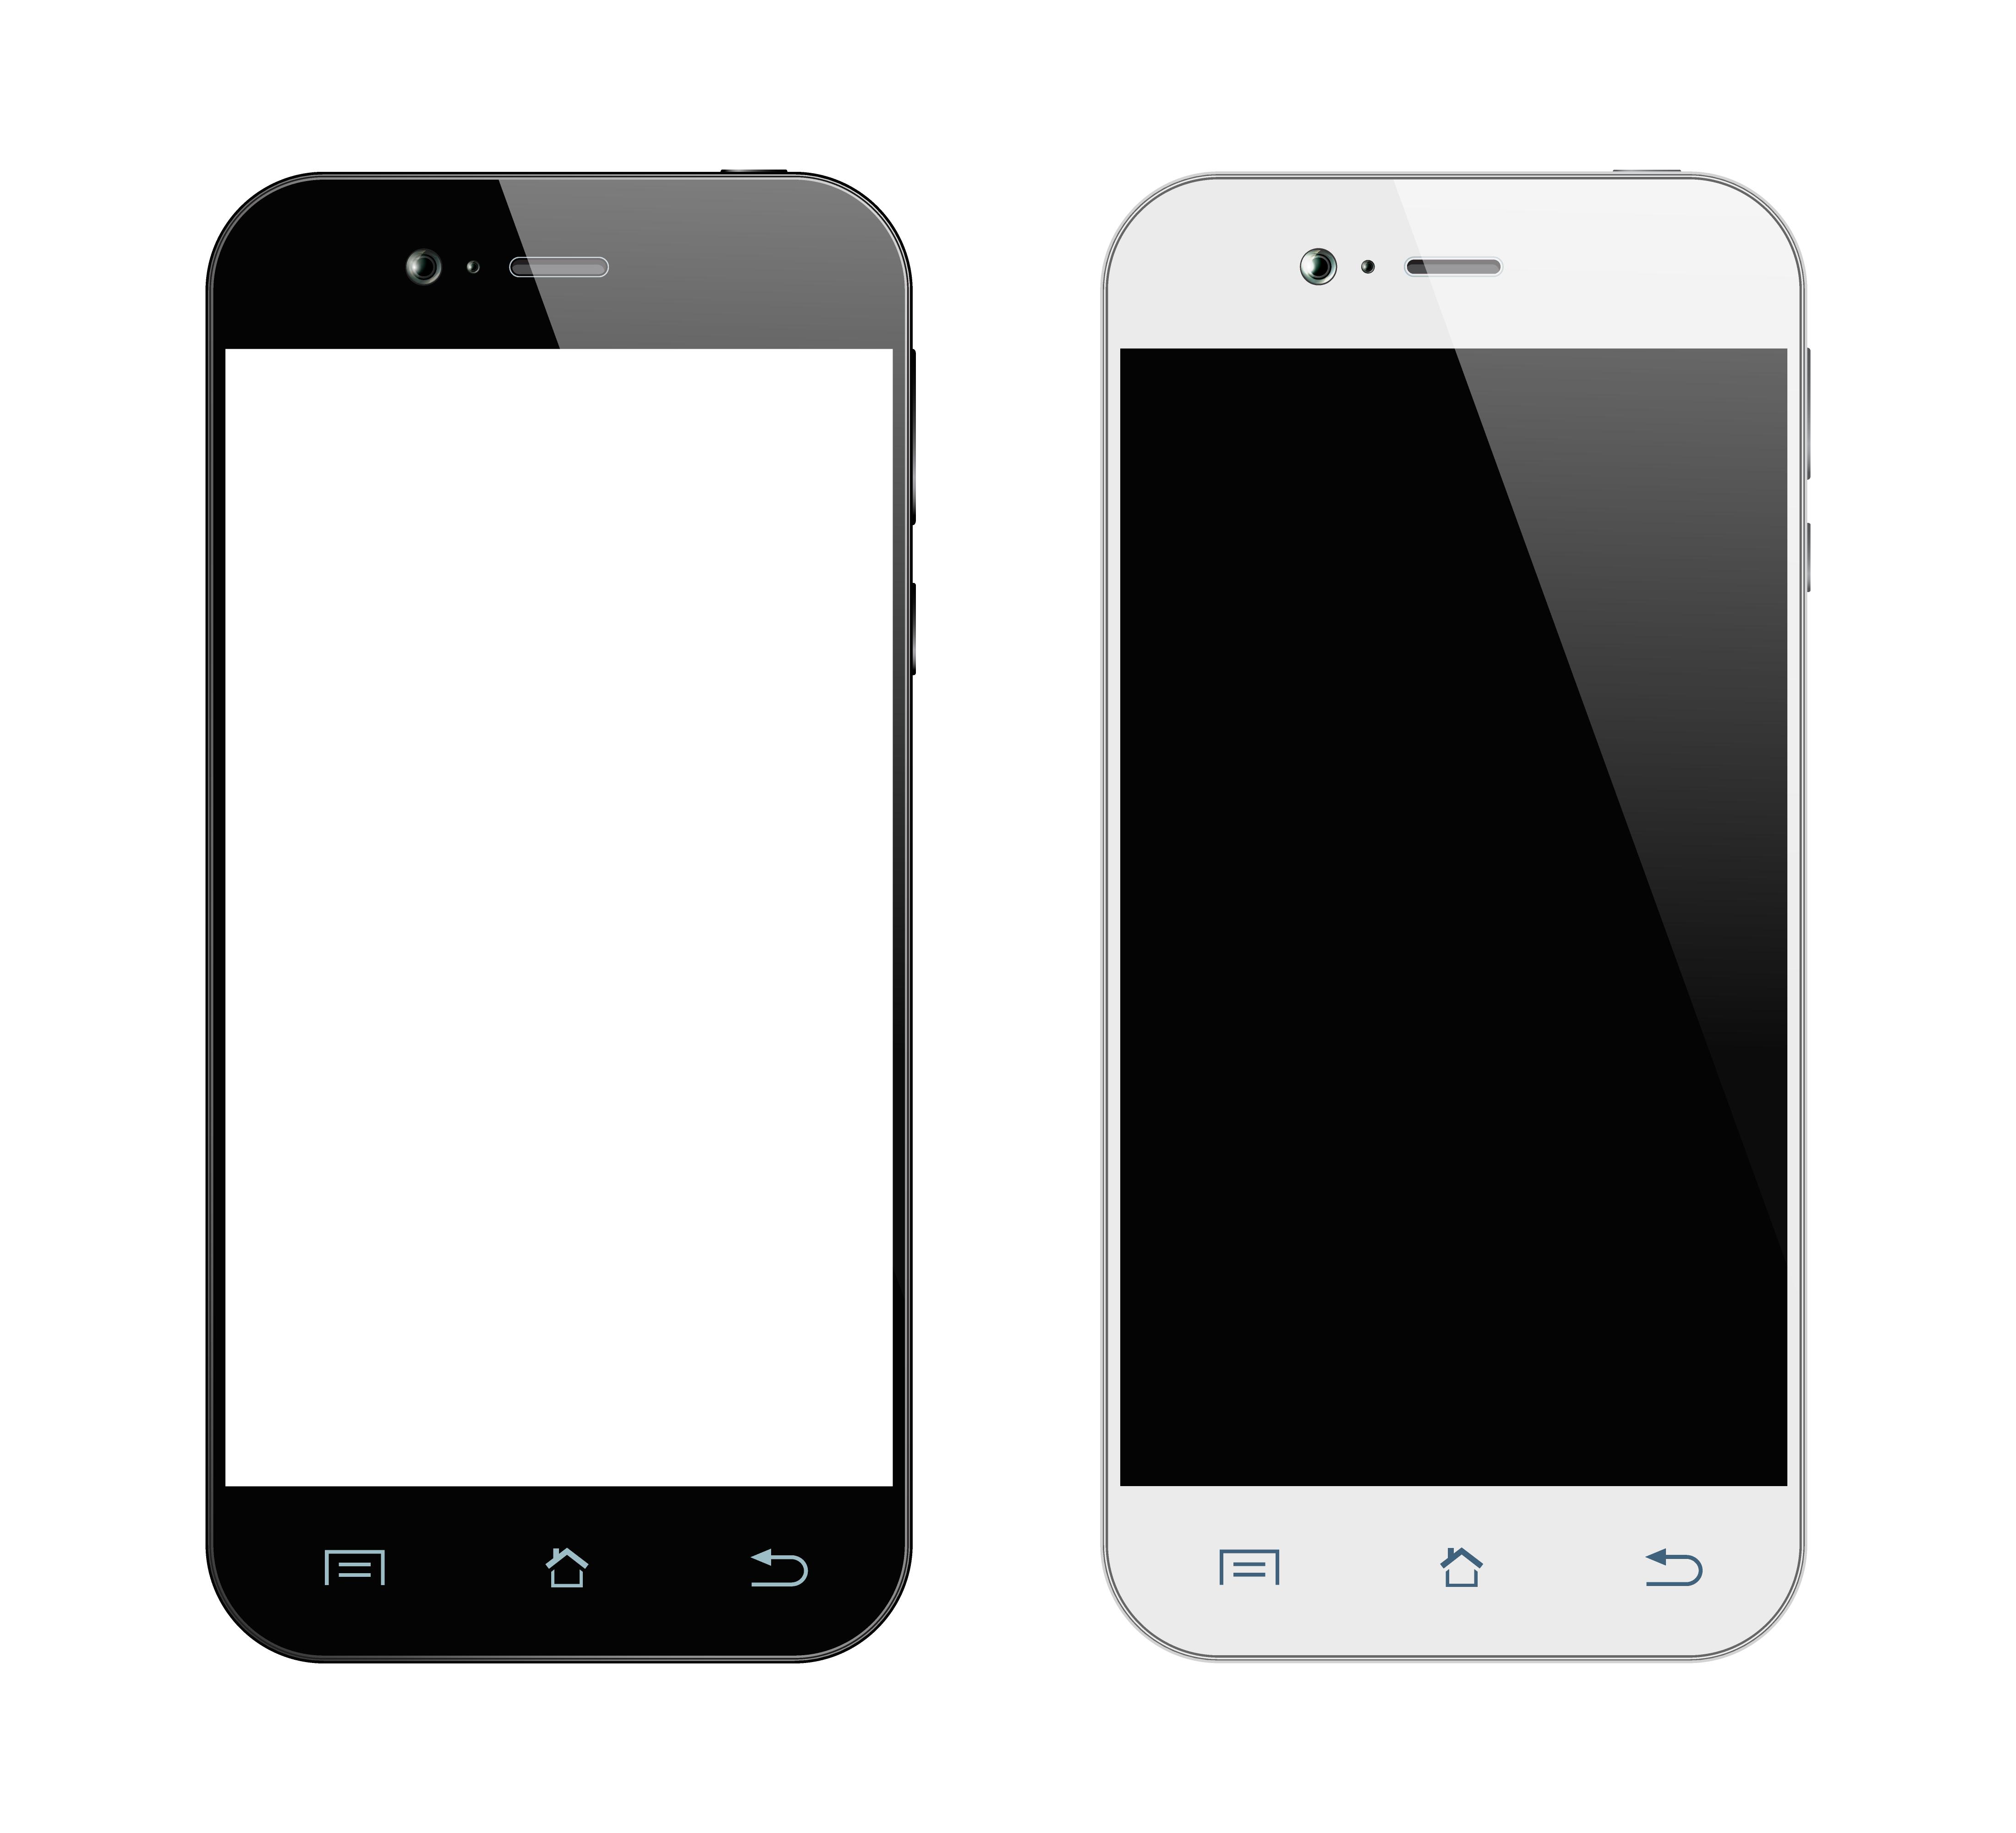 Smartphones - Download Free Vectors, Clipart Graphics ...